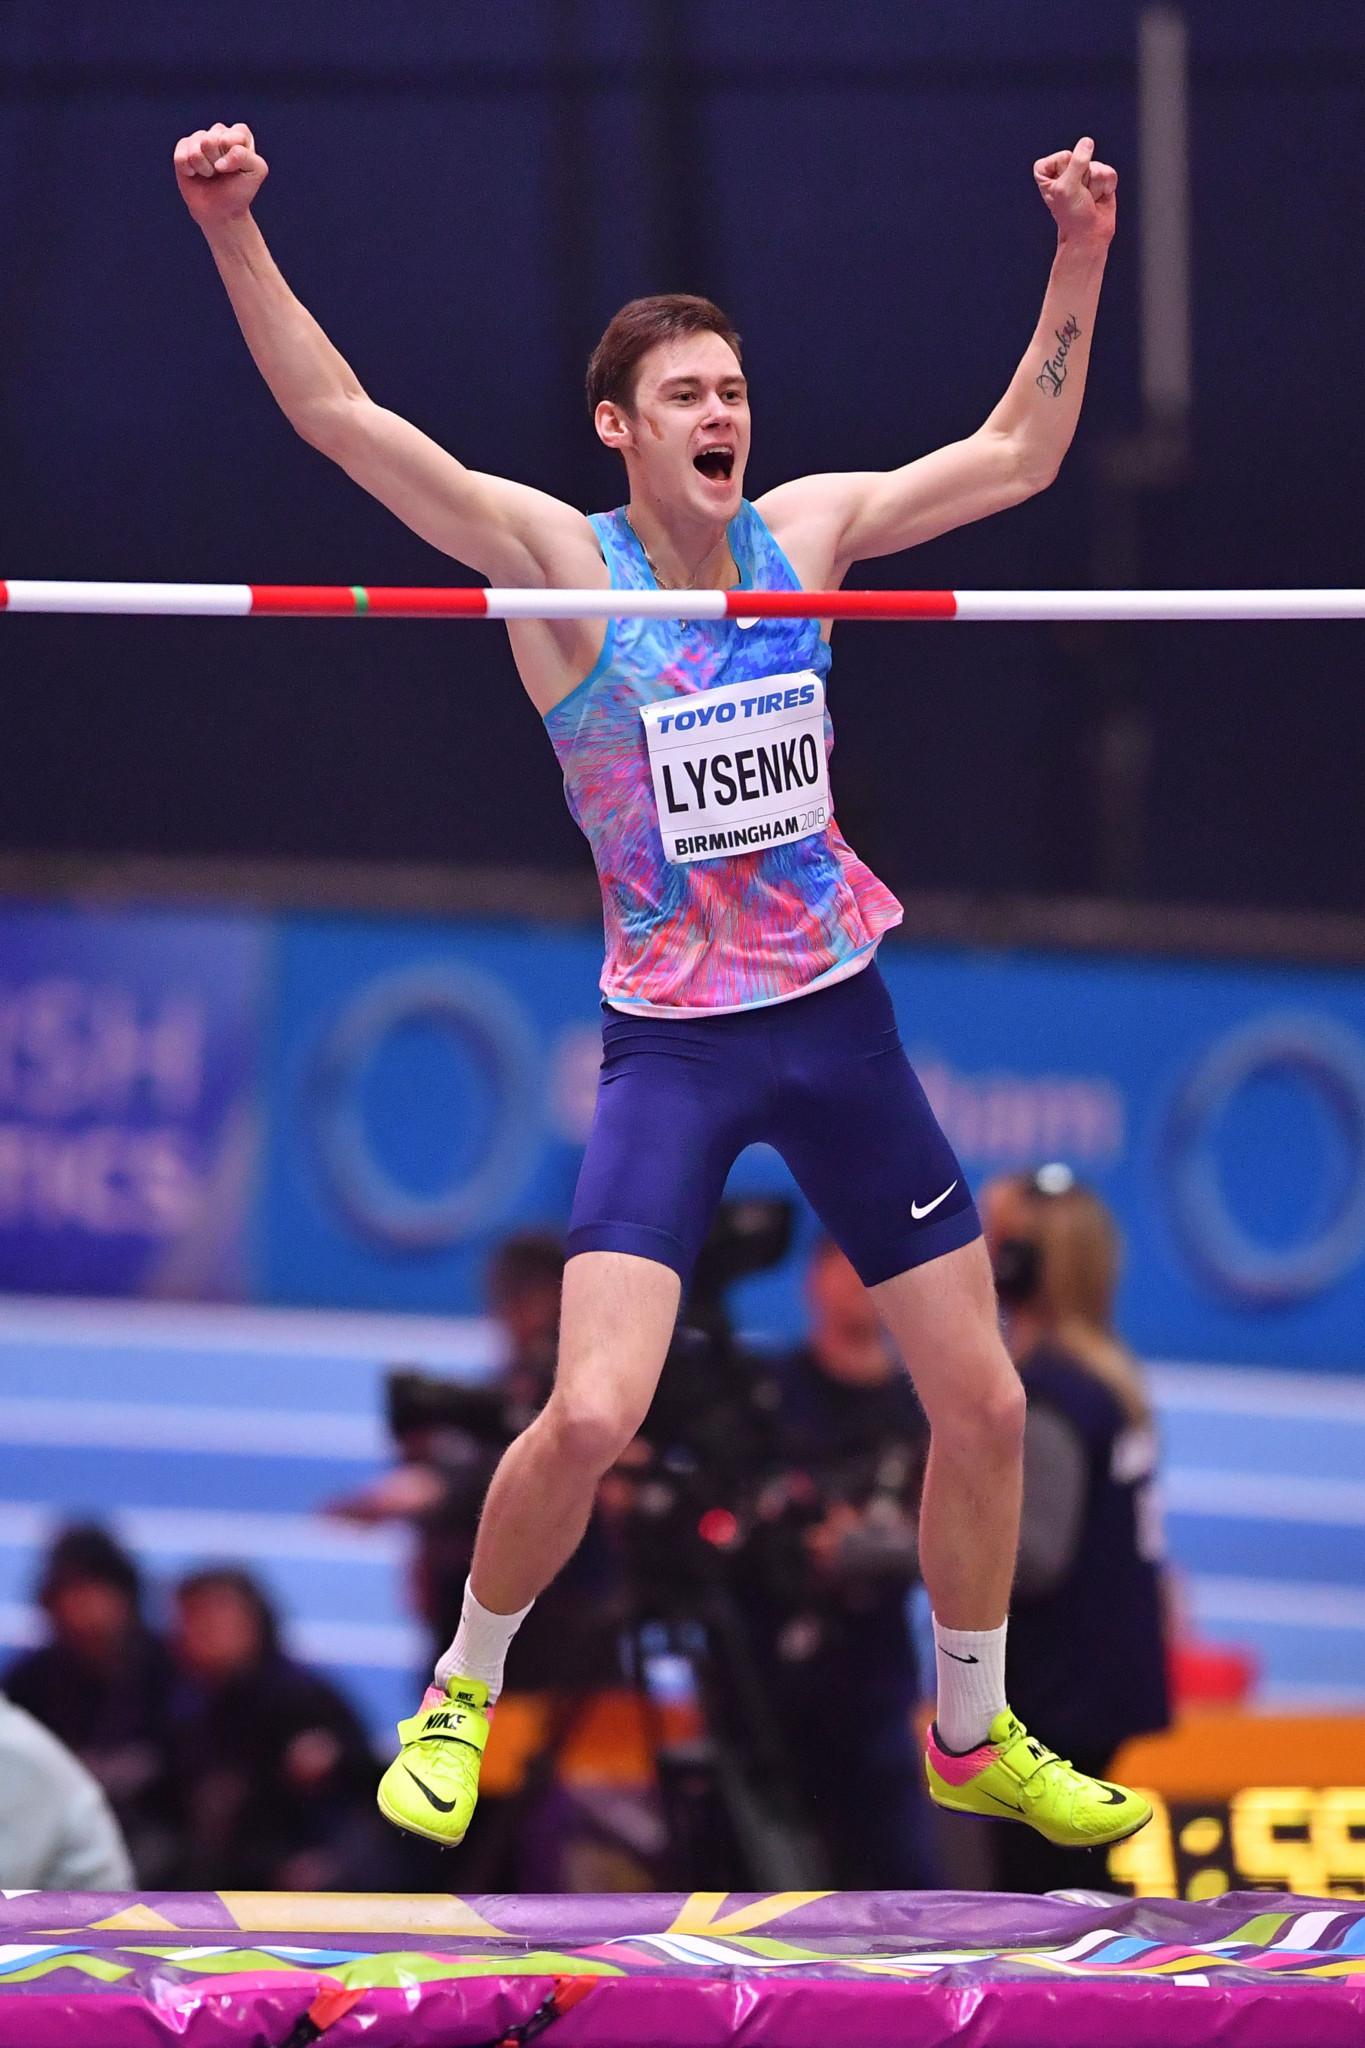 Lysenko turns tables on Barshim to win IAAF World Indoor Championships high jump gold